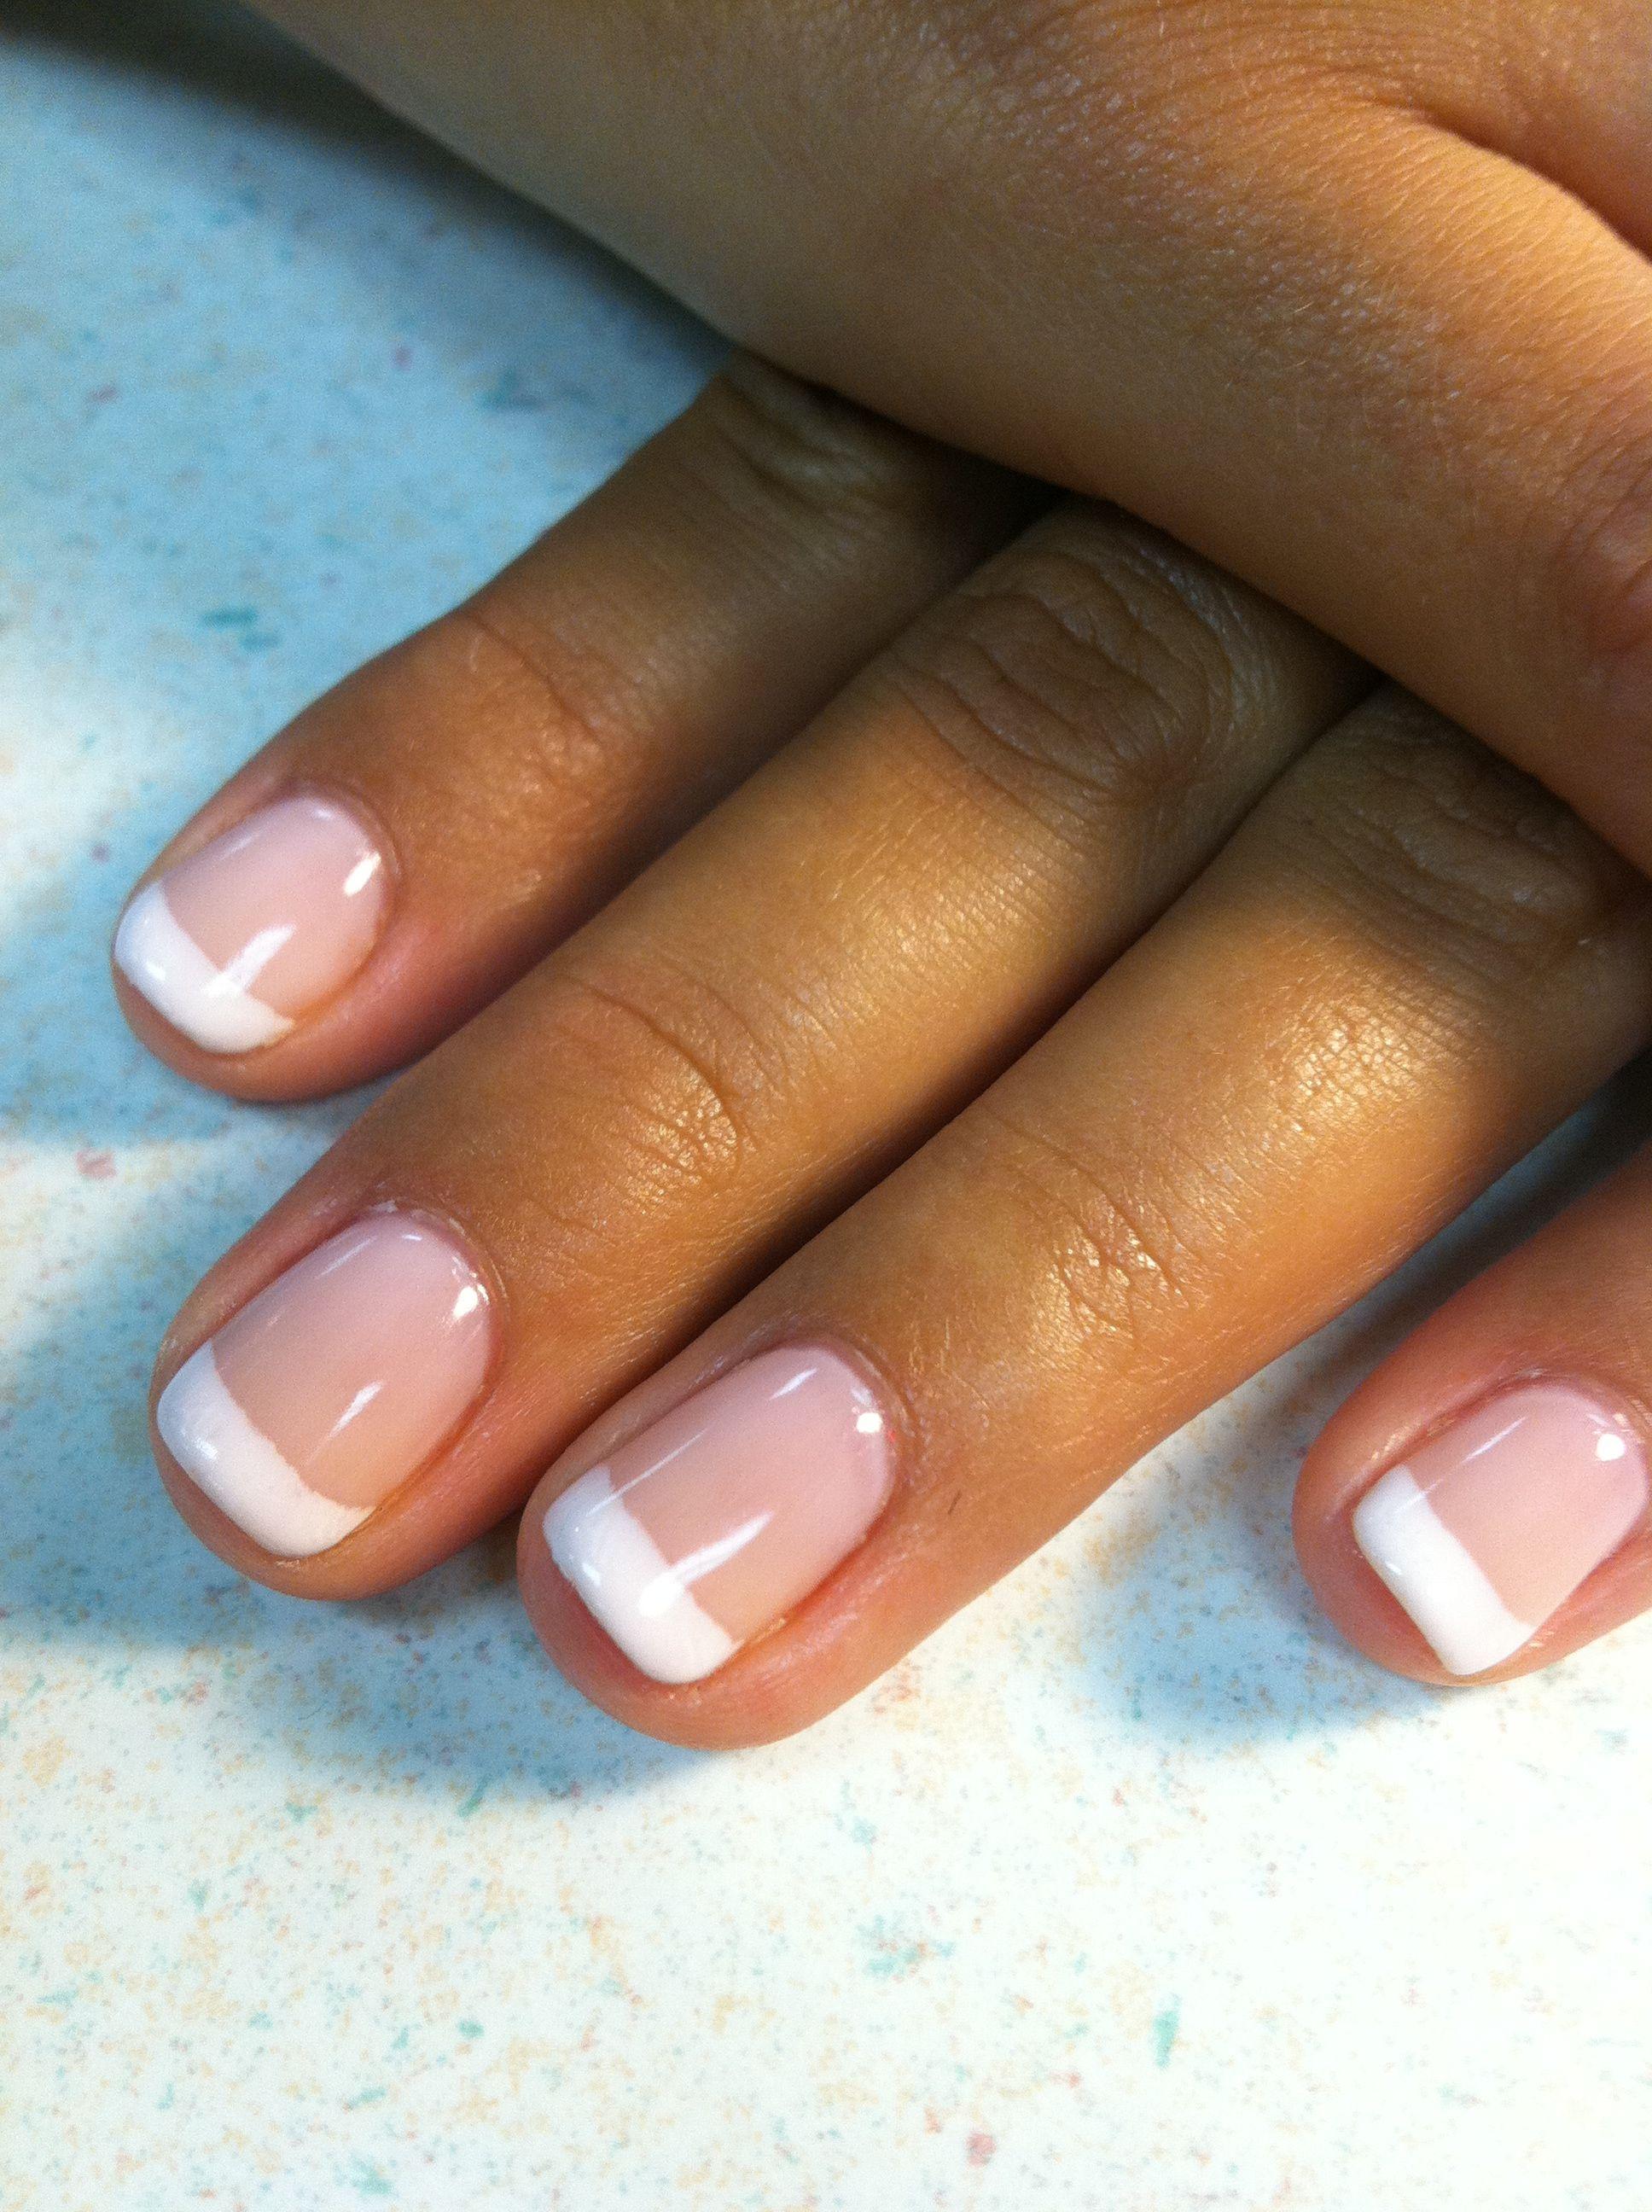 Te Amo French Manicure I Used Opi S Gel Polishes Bubble Bath